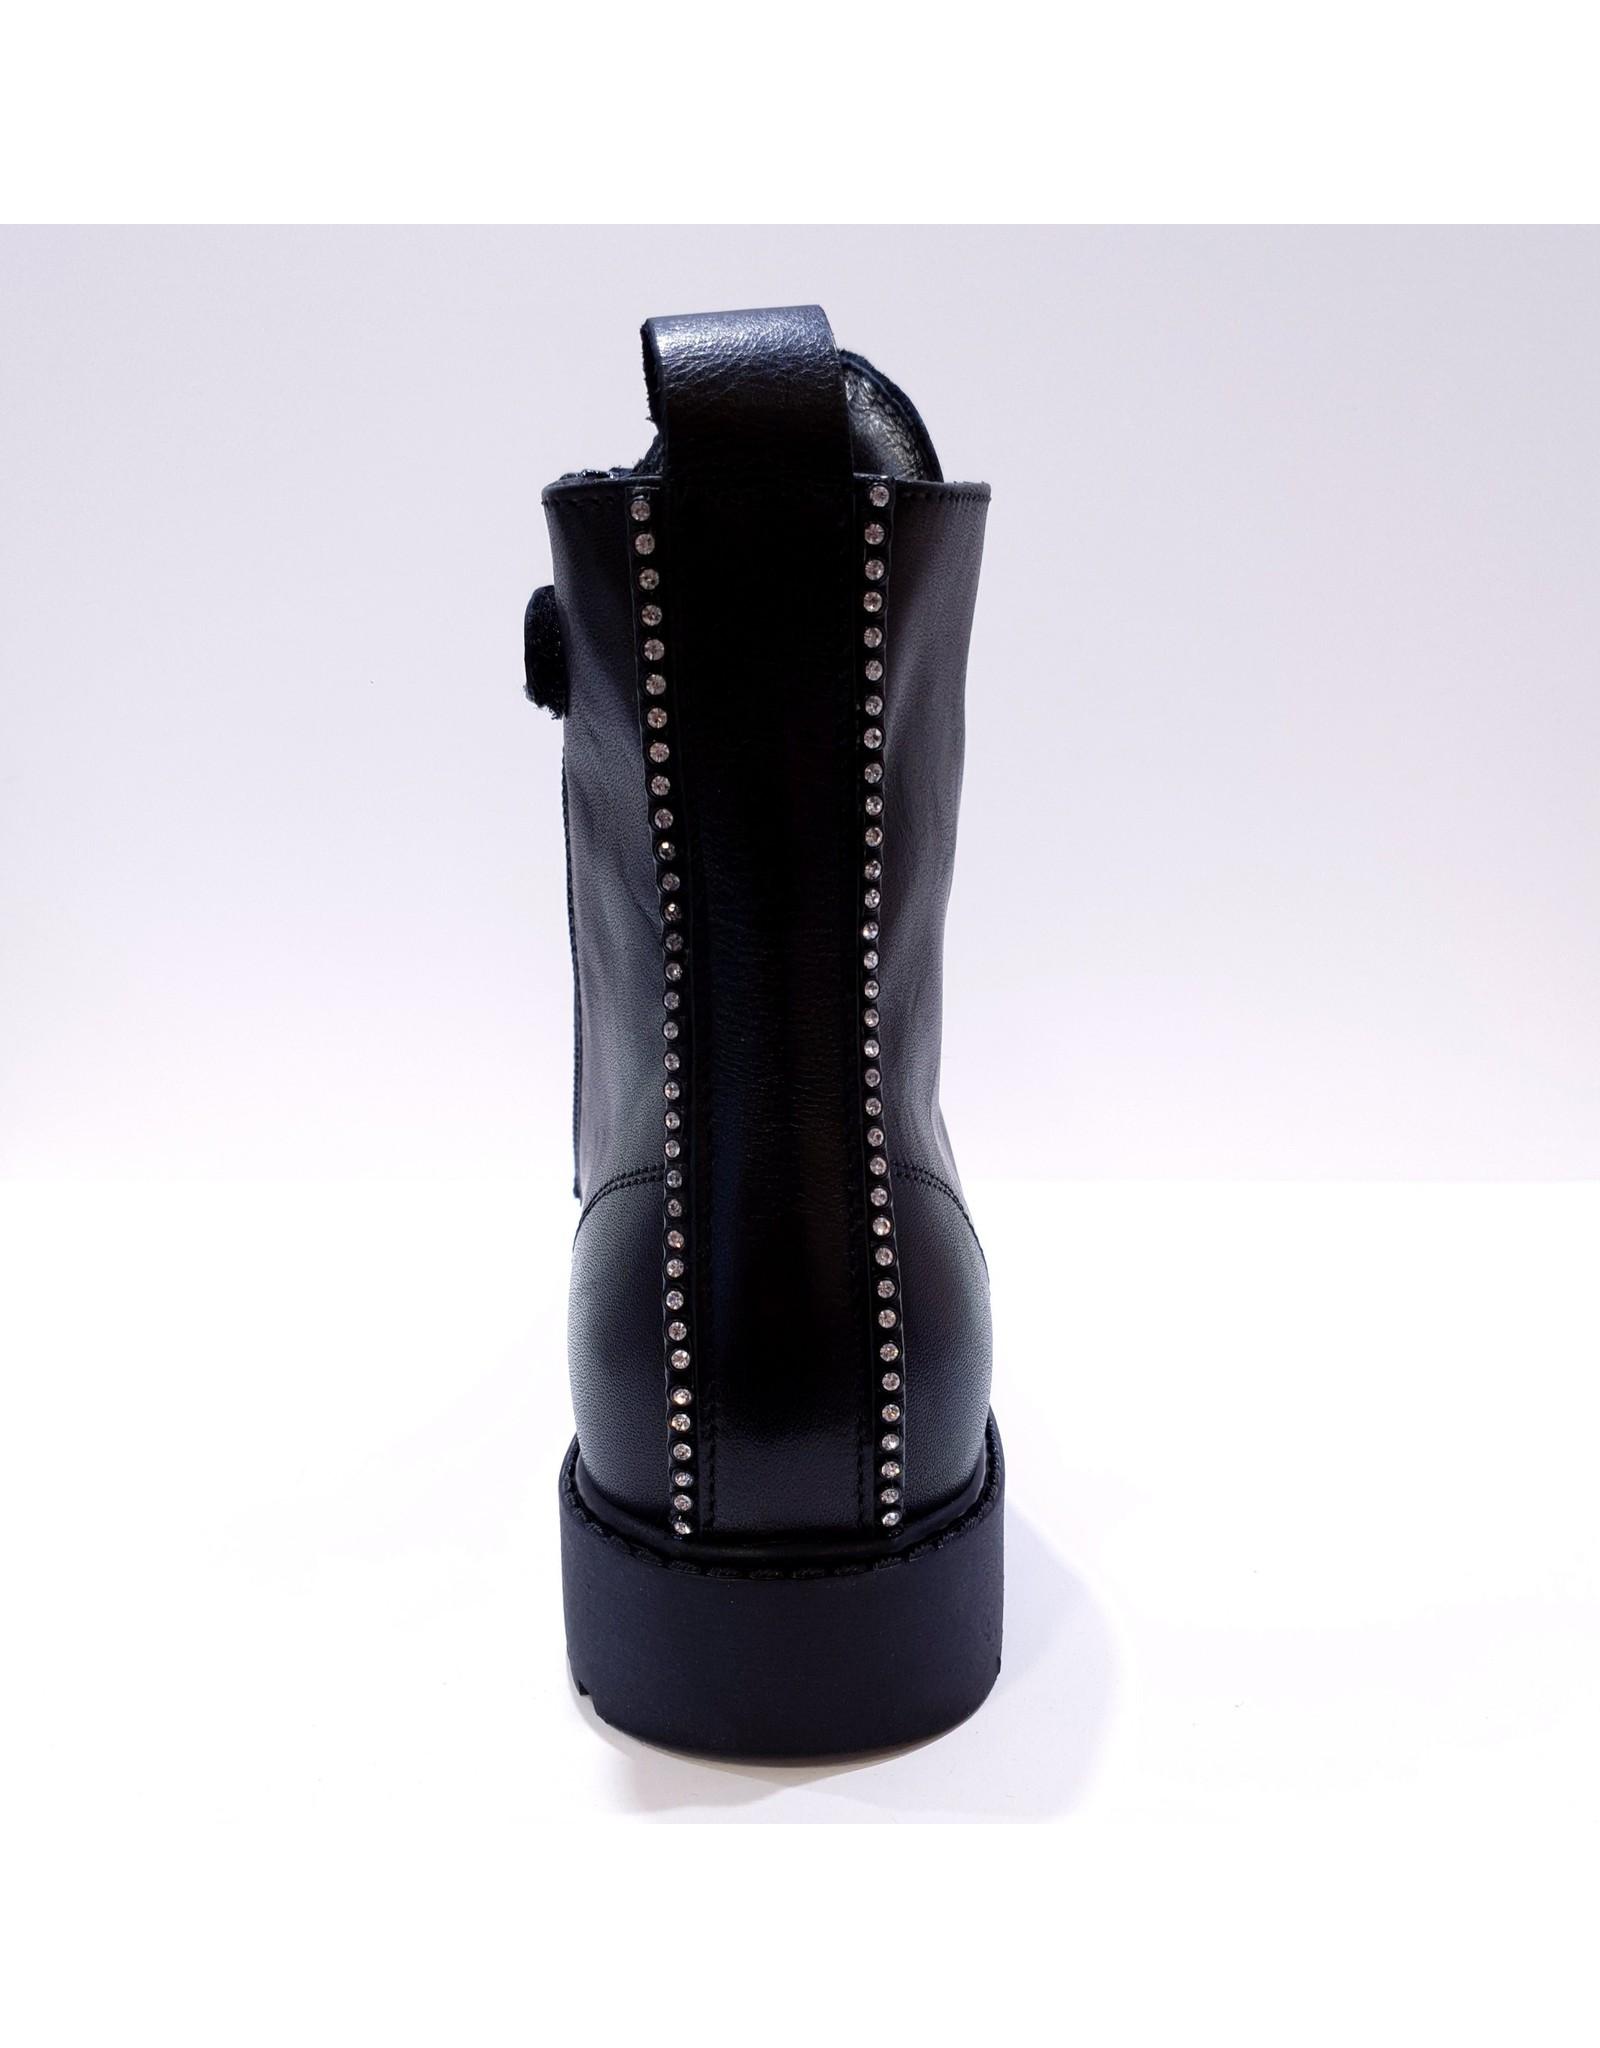 Andrea Morelli veterlaars black/studs